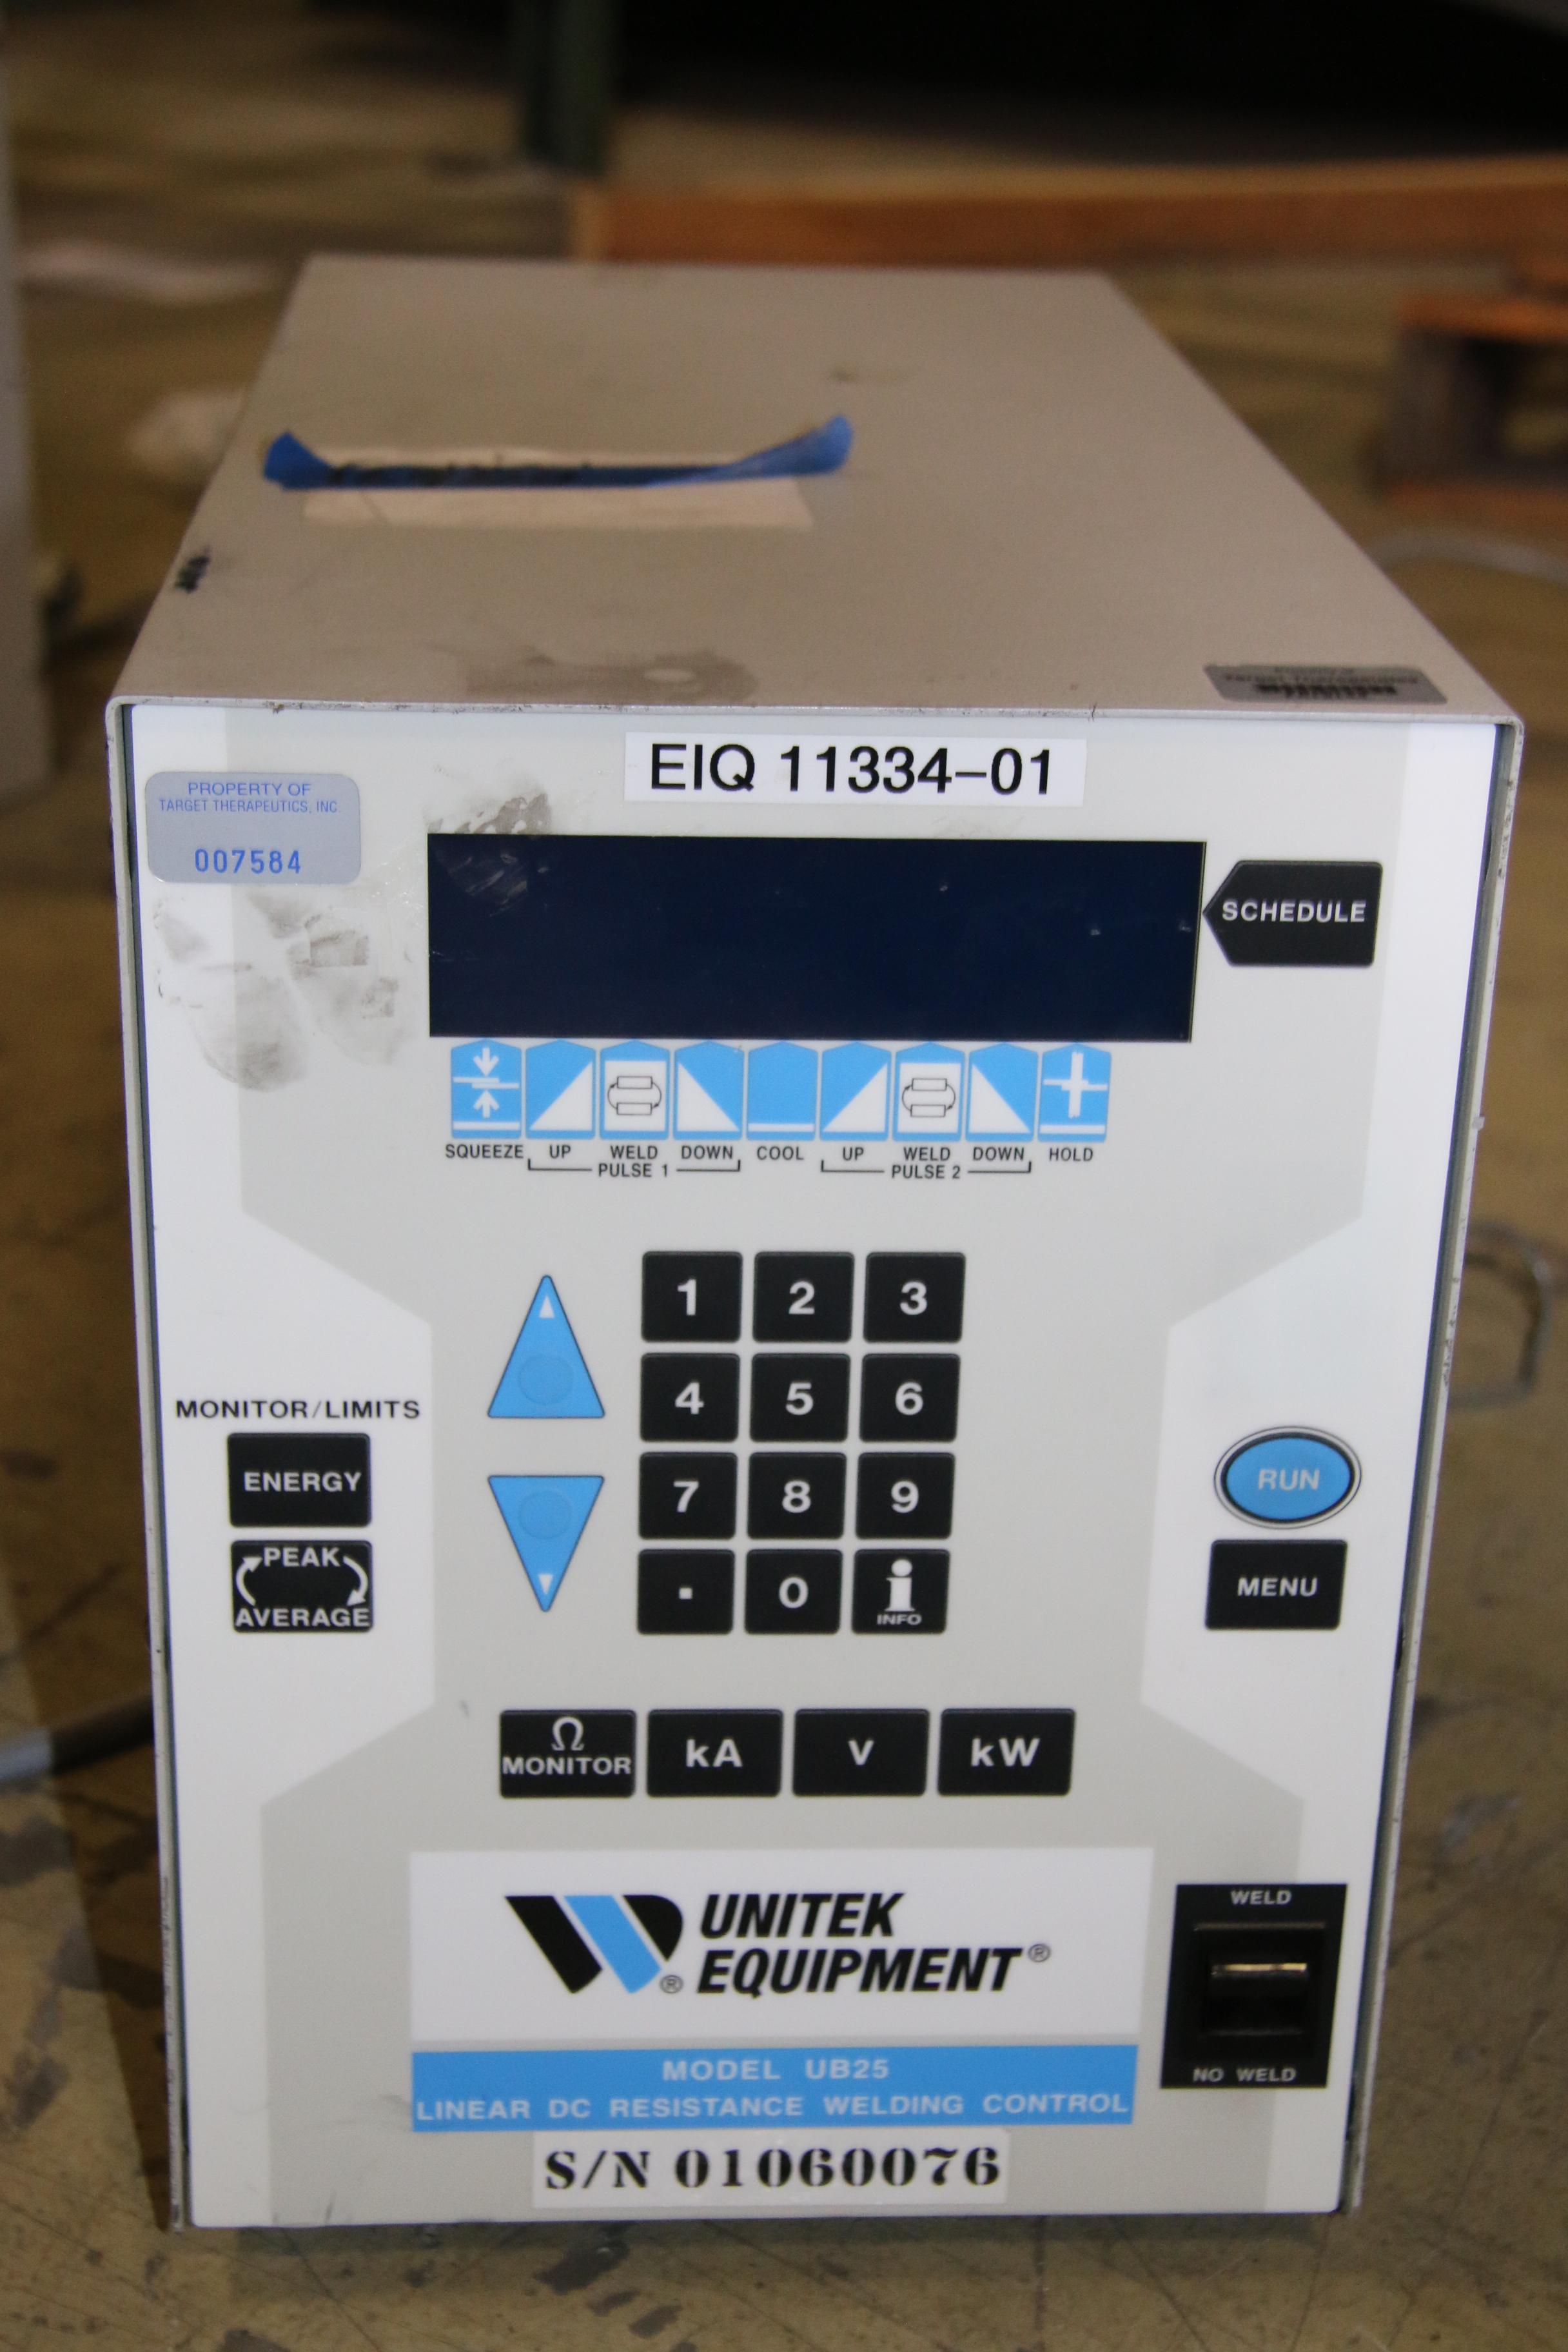 (1) Used Unitek Equipment Model: UB25 Linear DC Resistance Welding Control